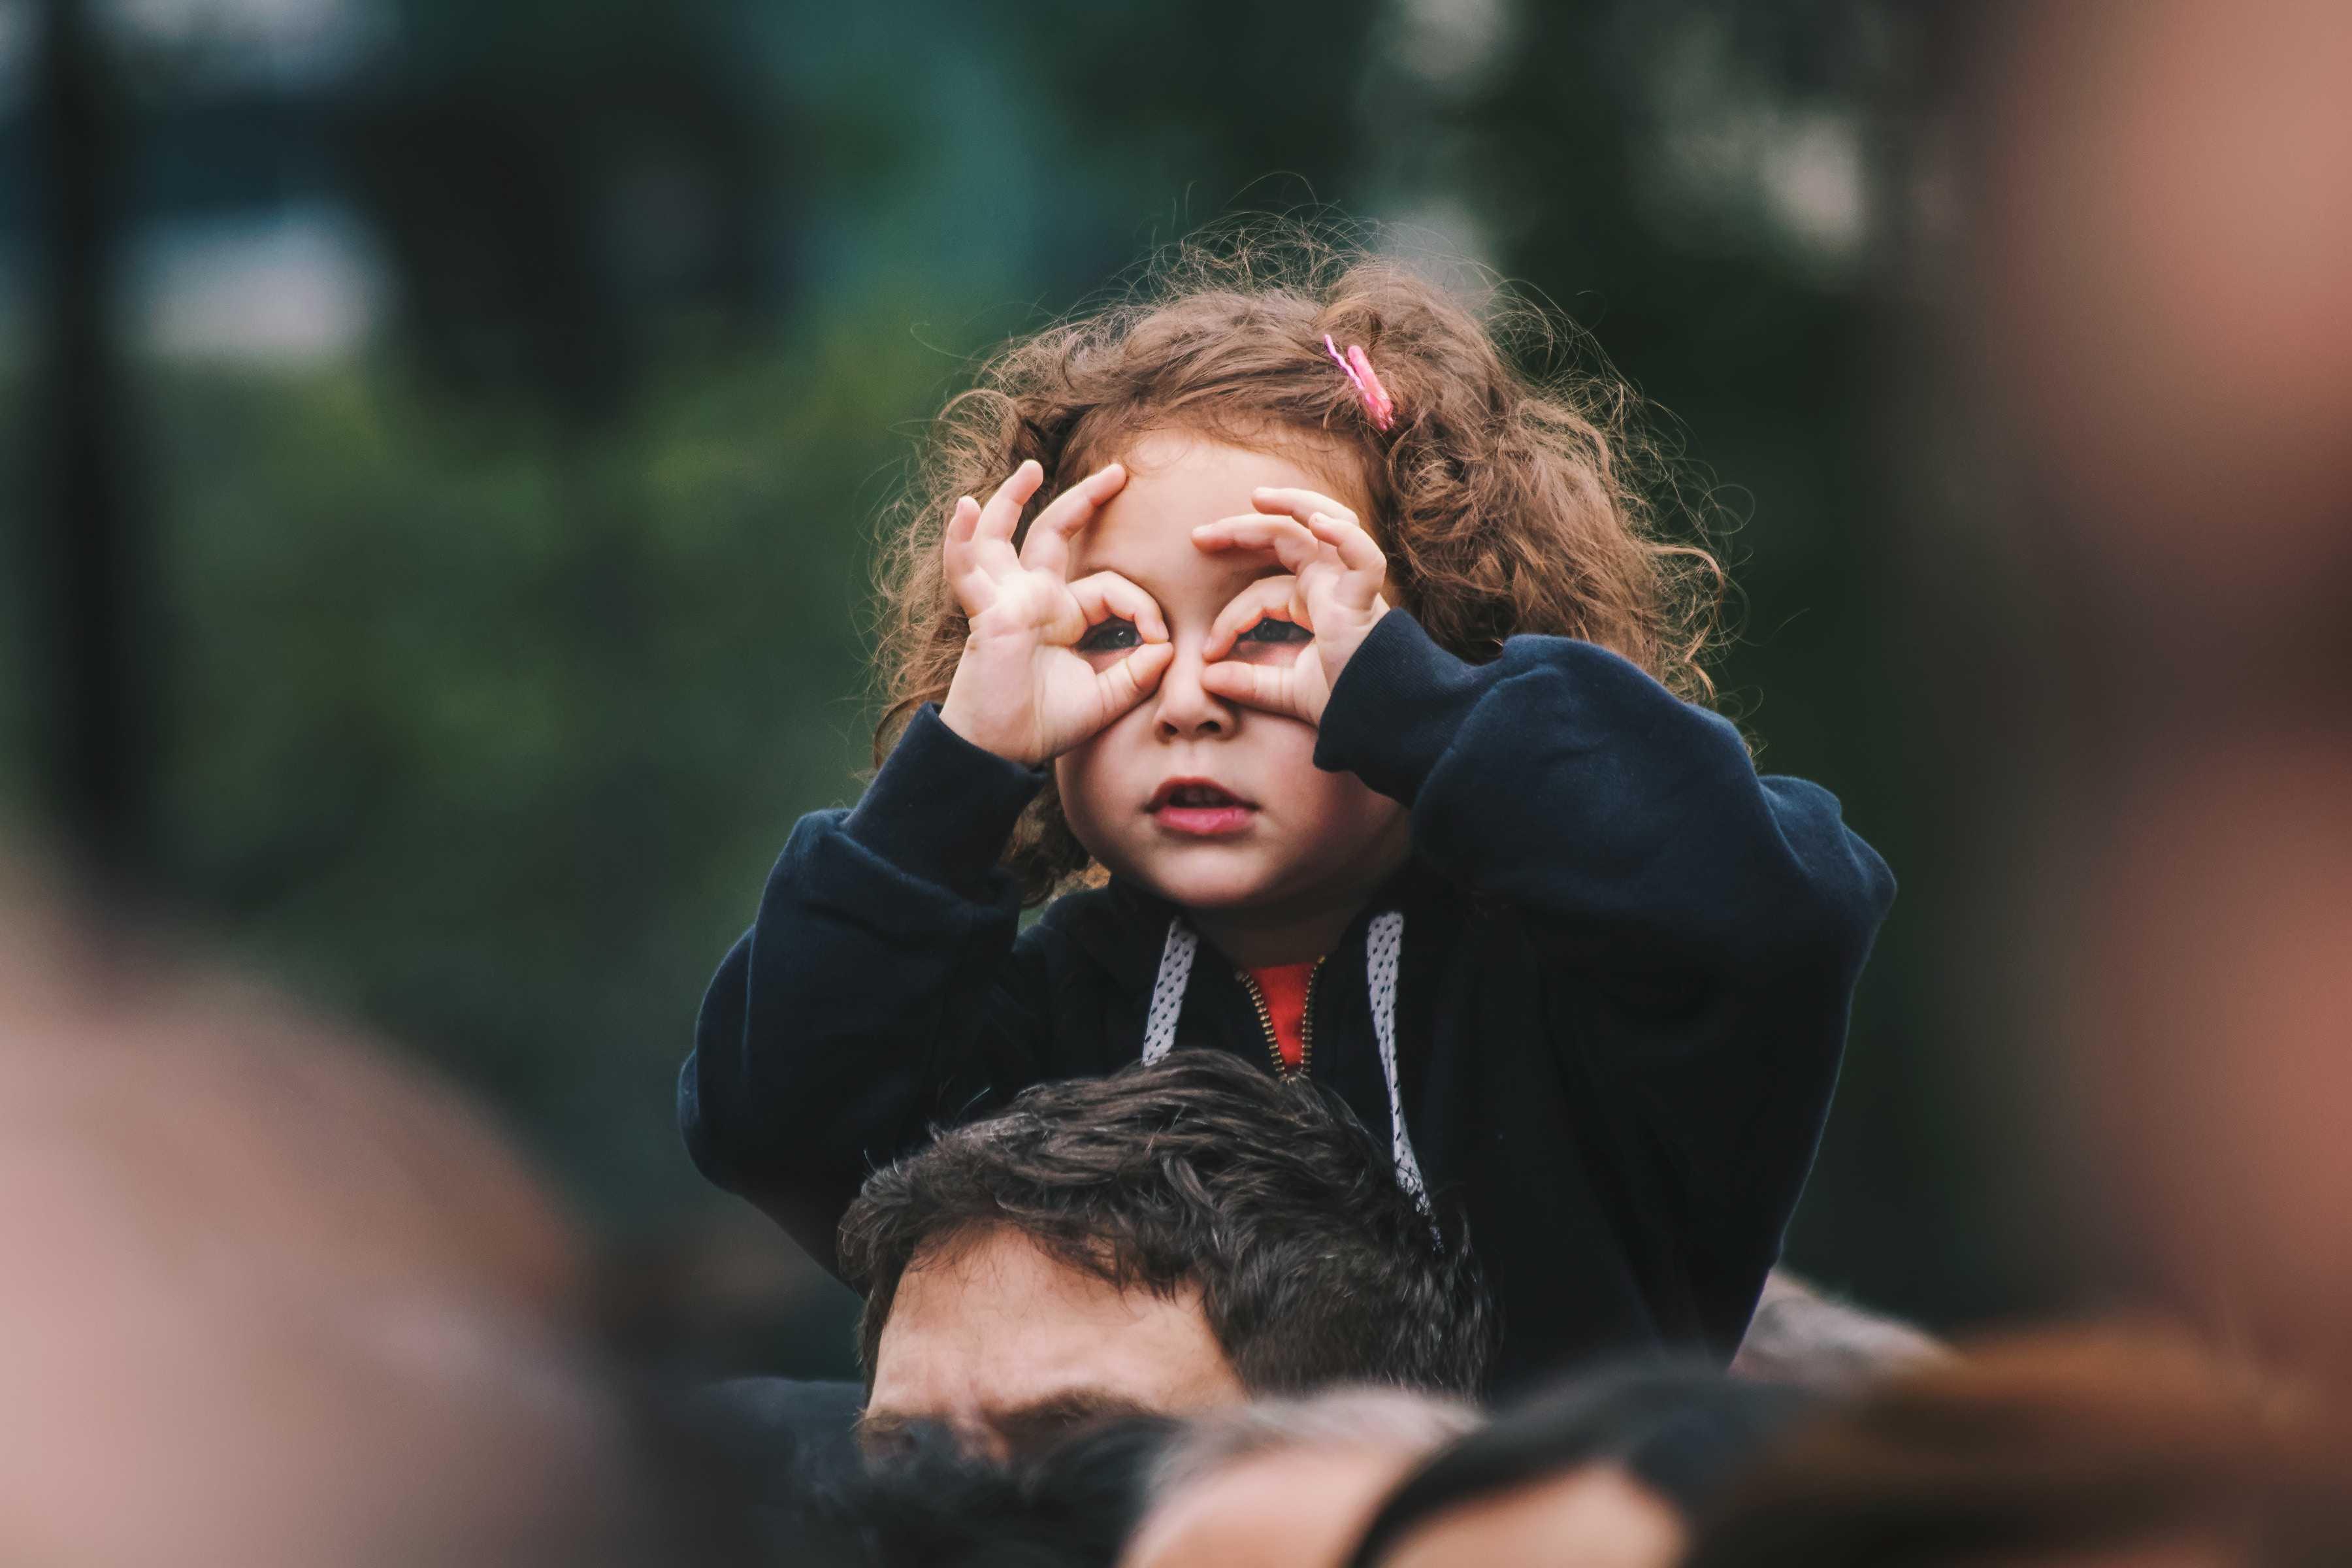 Little Kid Doing Binocular Gesture | Kids Car Donations